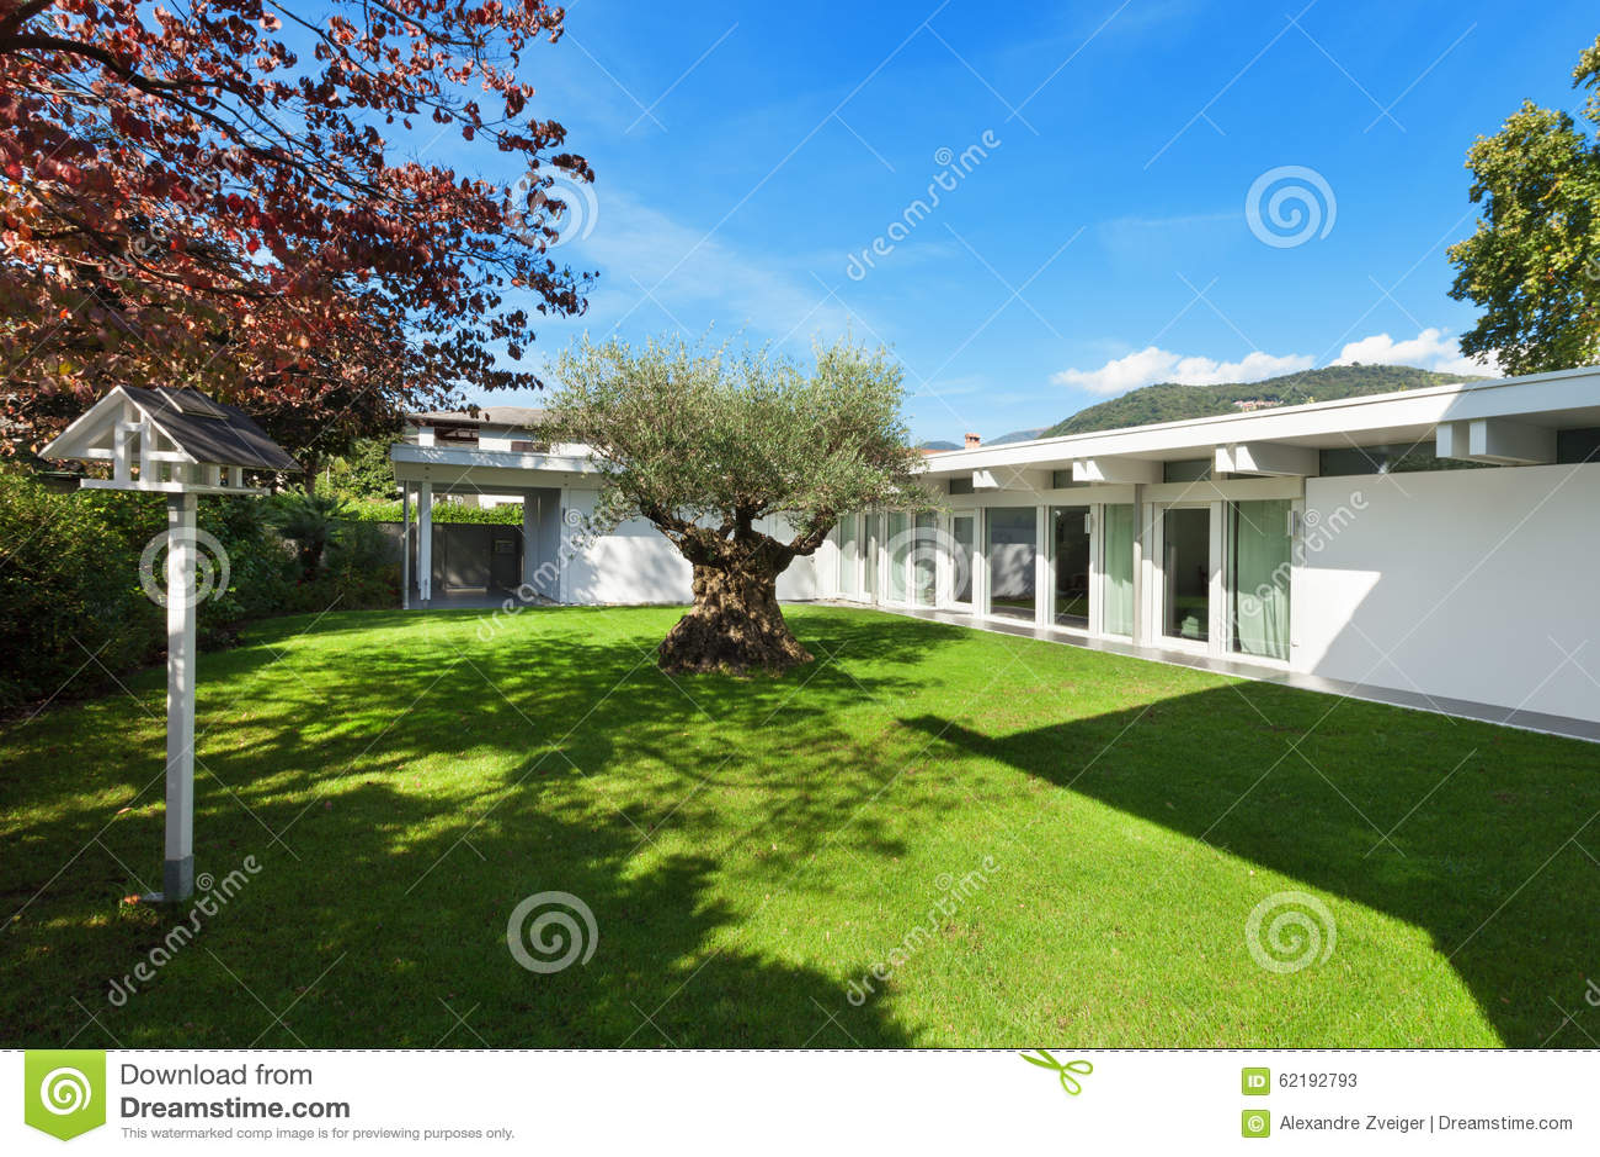 Jardin d 39 une maison moderne avec l 39 olivier photo stock image 62192793 - Jardin maison moderne ...